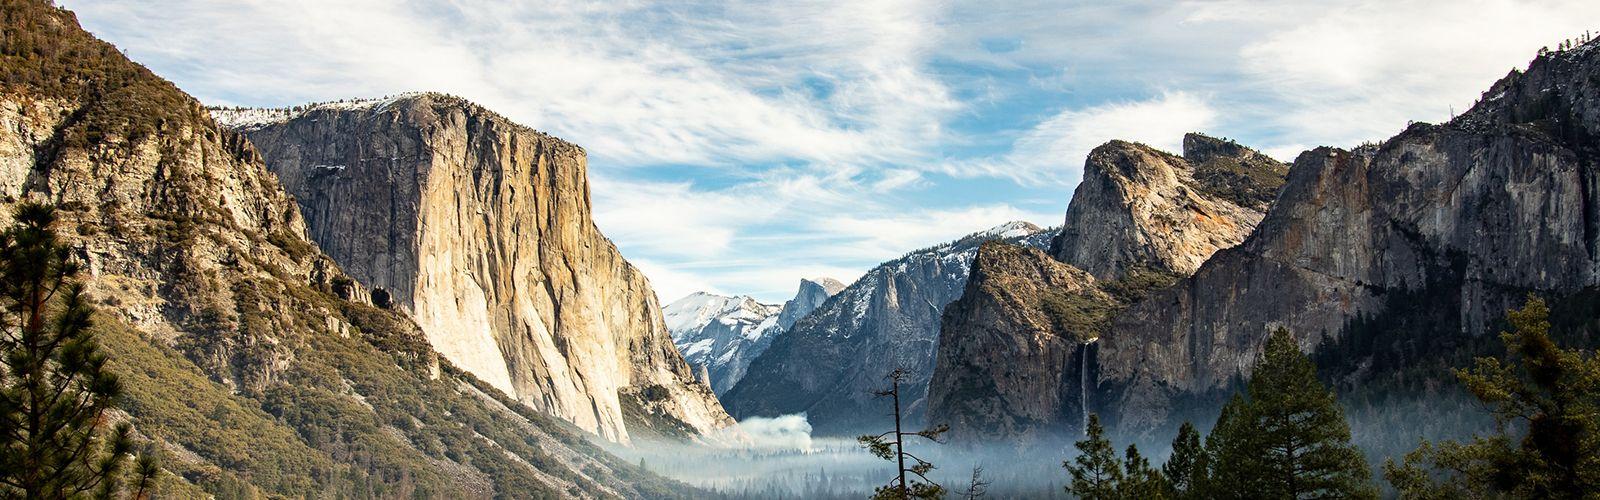 Yosemite Climbing Expedition